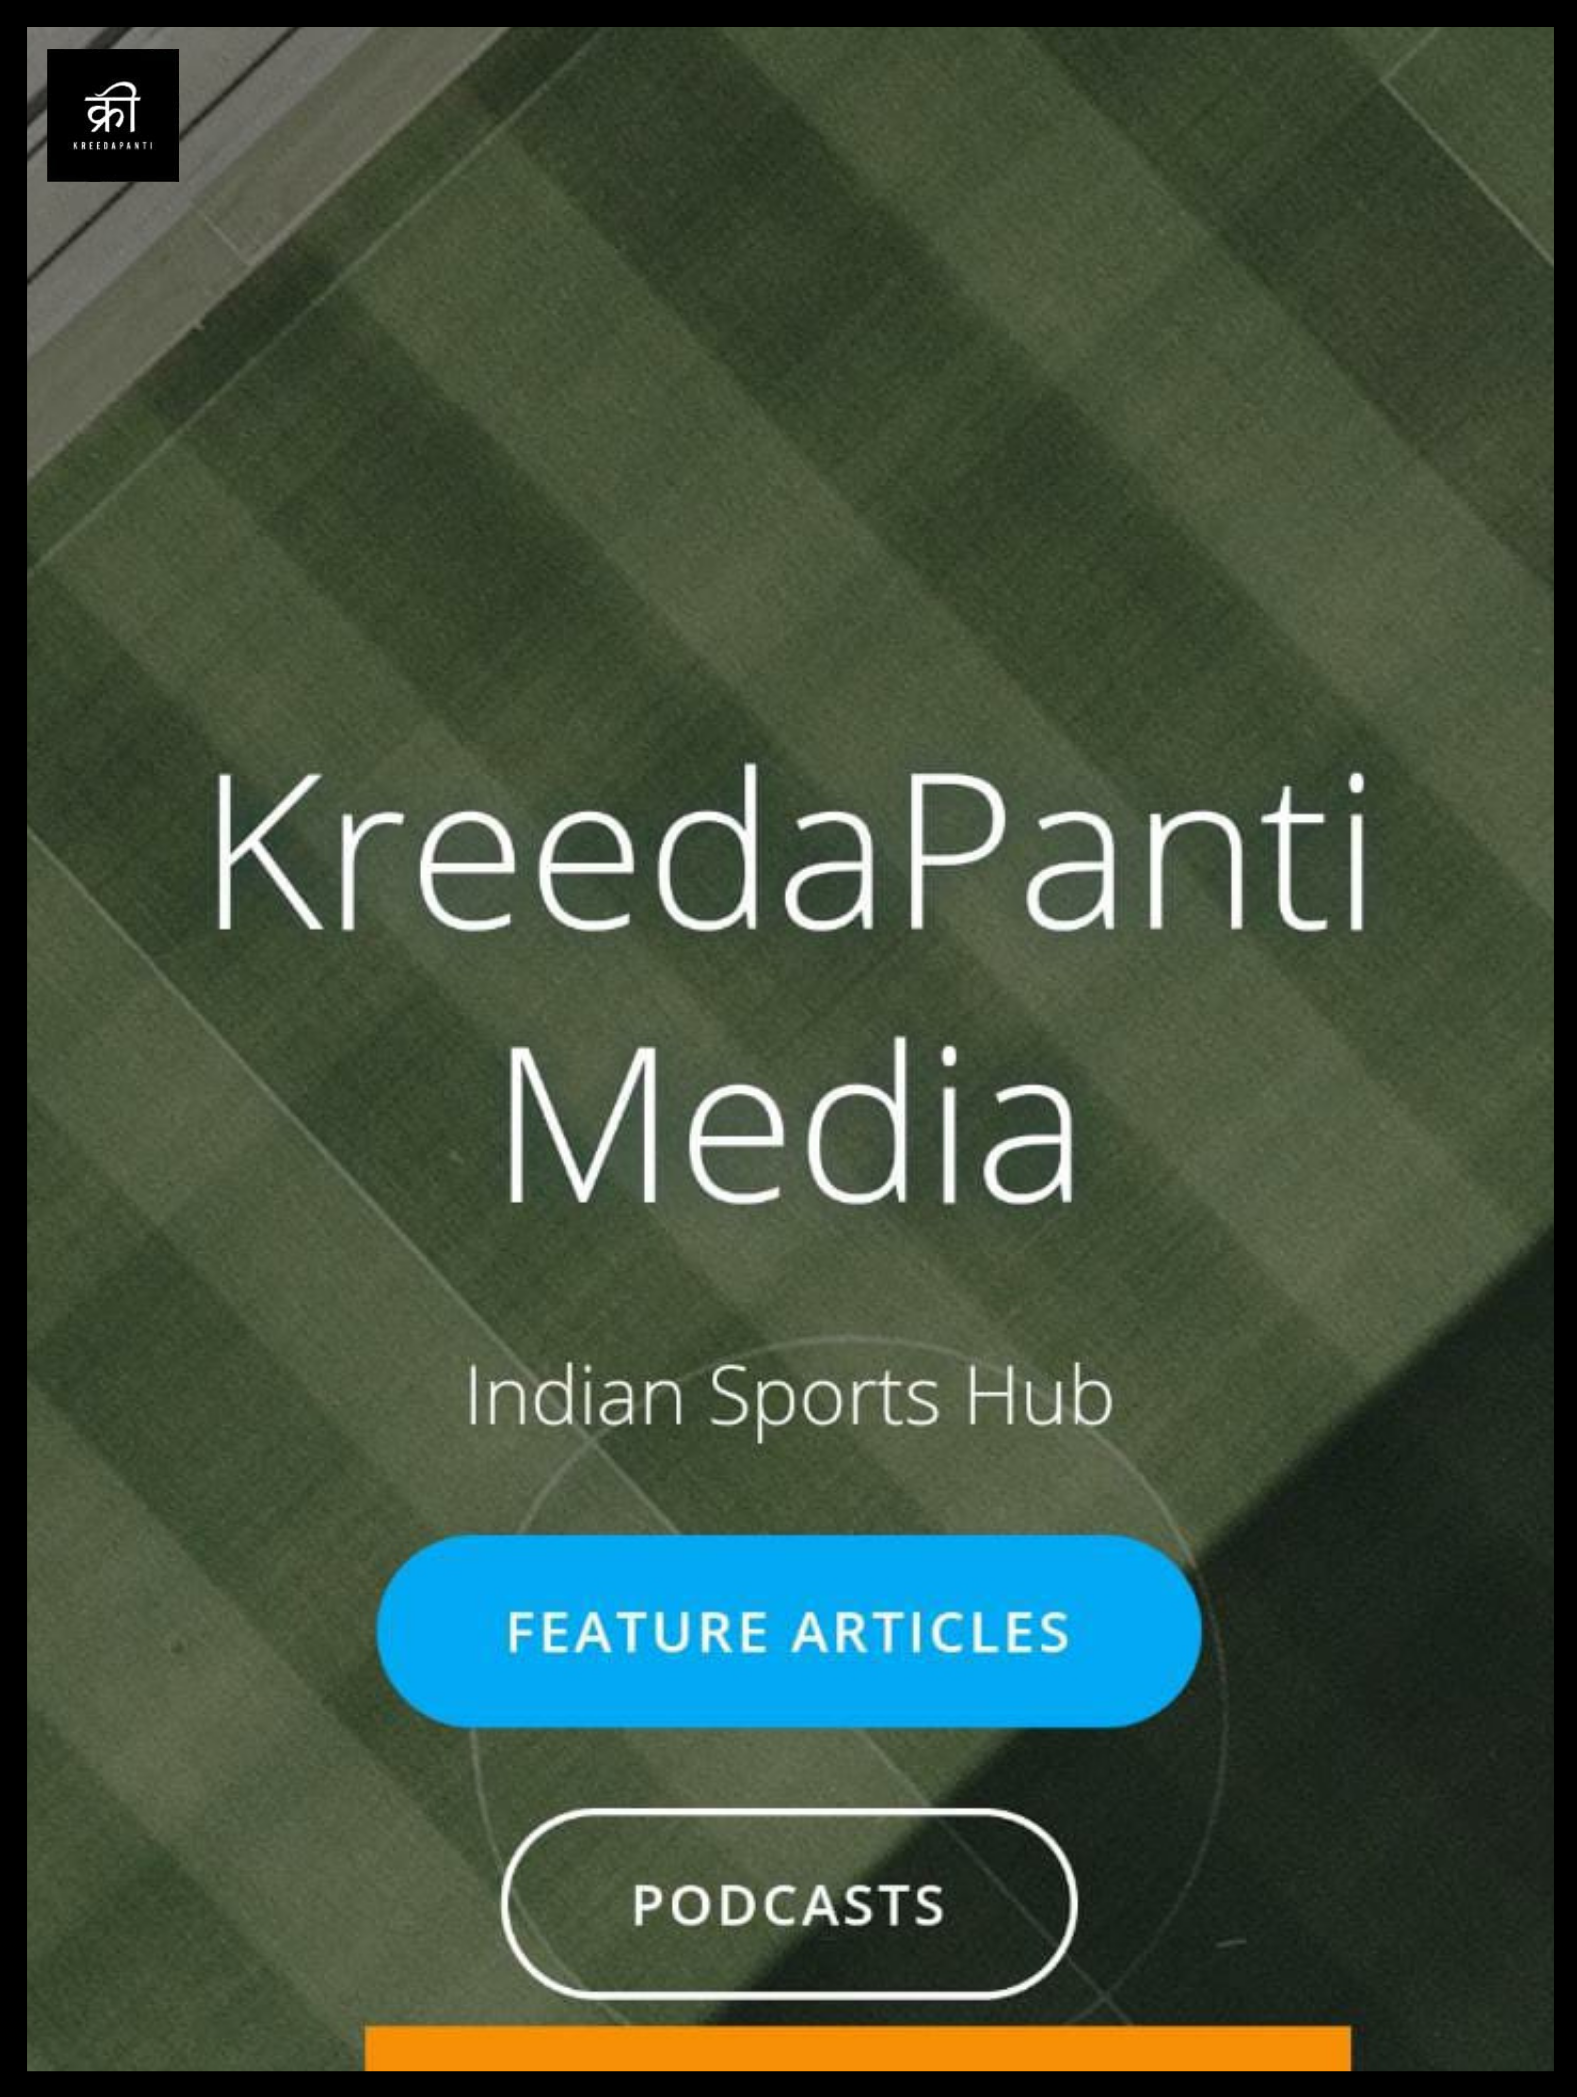 KreedaPanti Media House